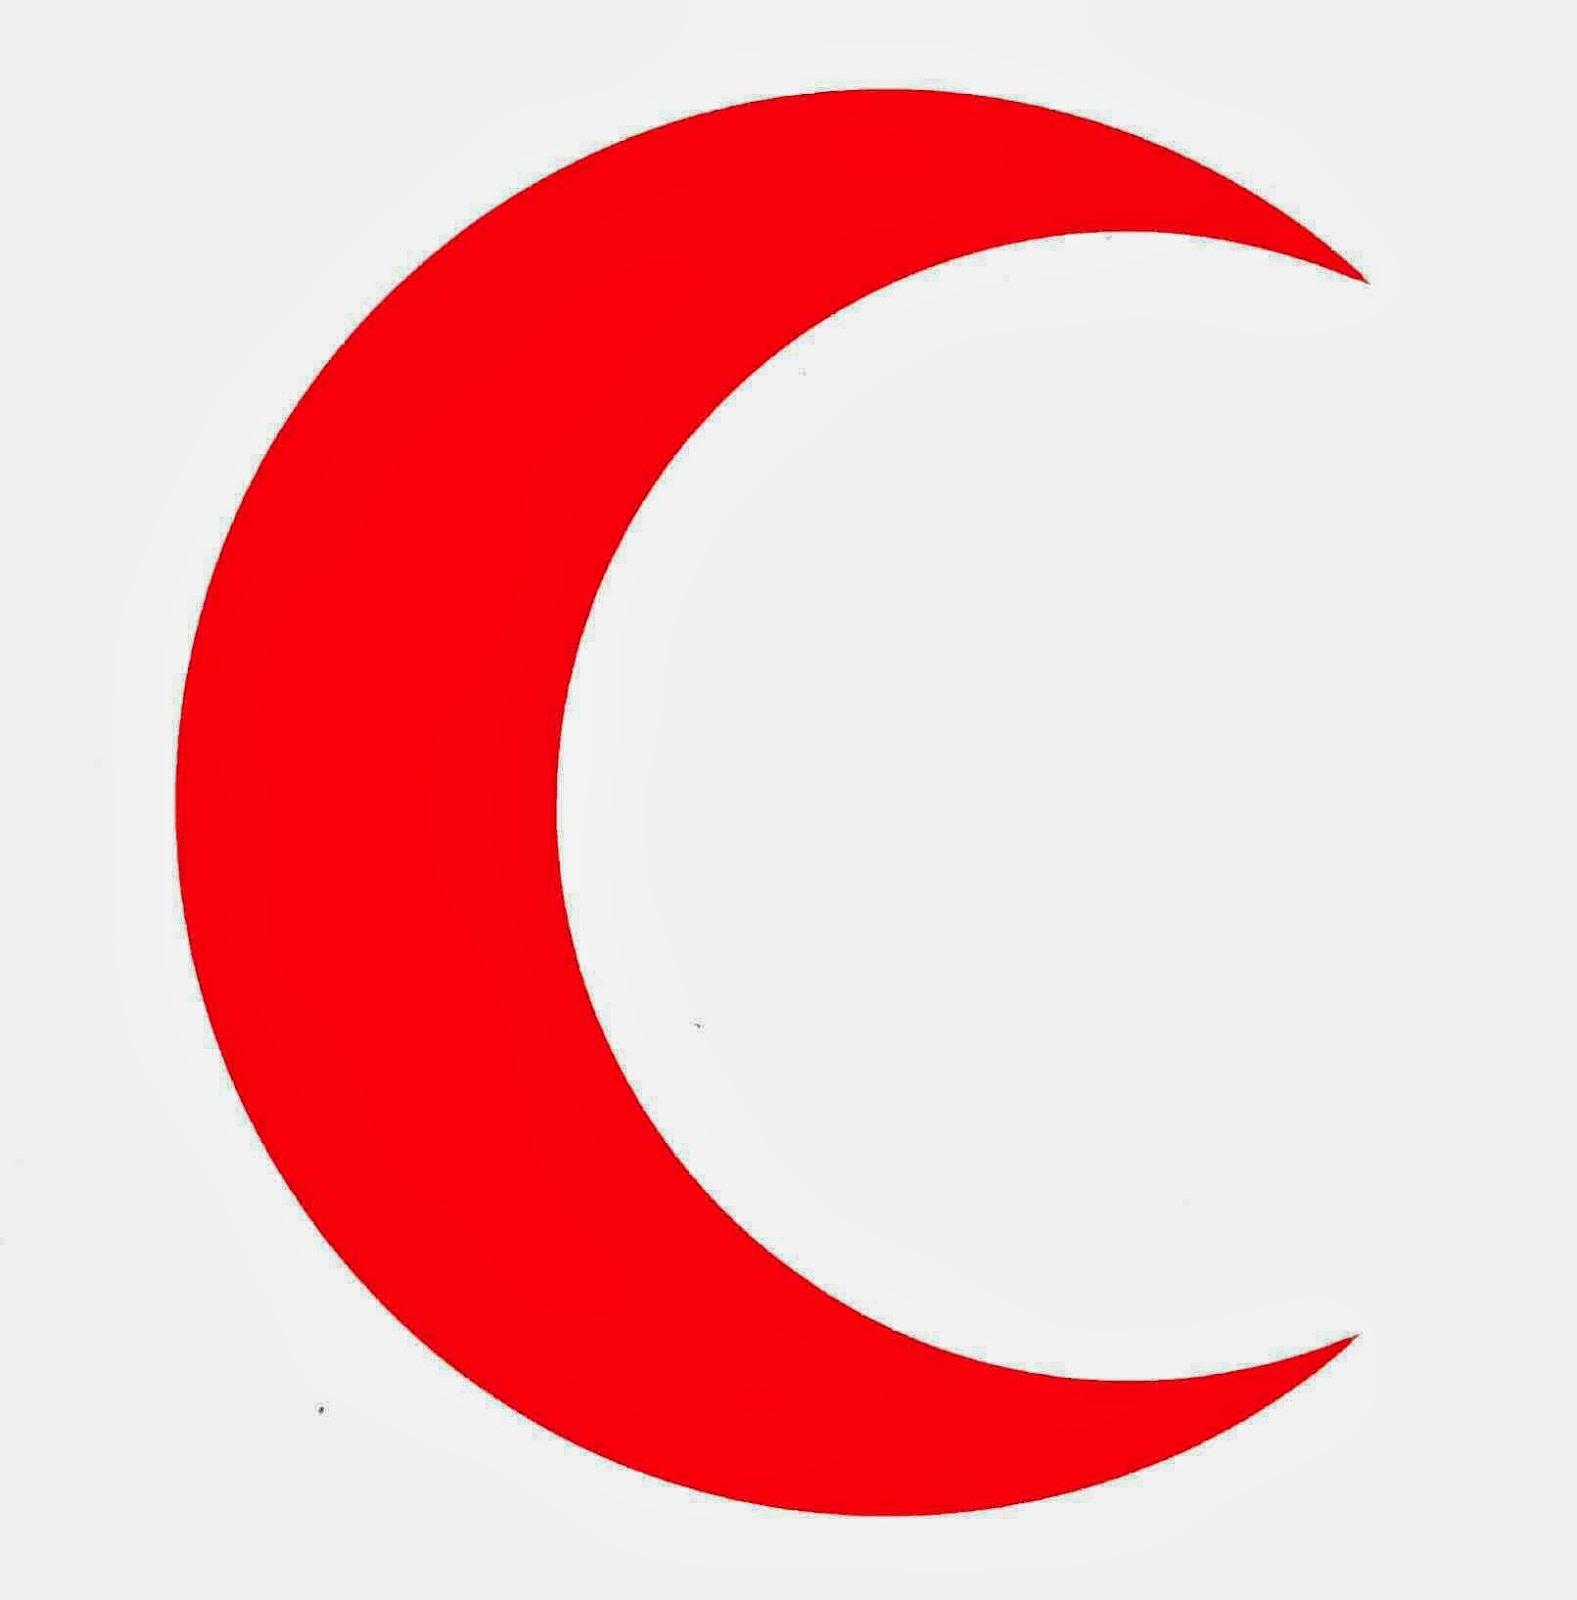 PMR SMKN 3 GARUT BERSAMA TUK MANDIRI MANDIRI TUK BERSAMA